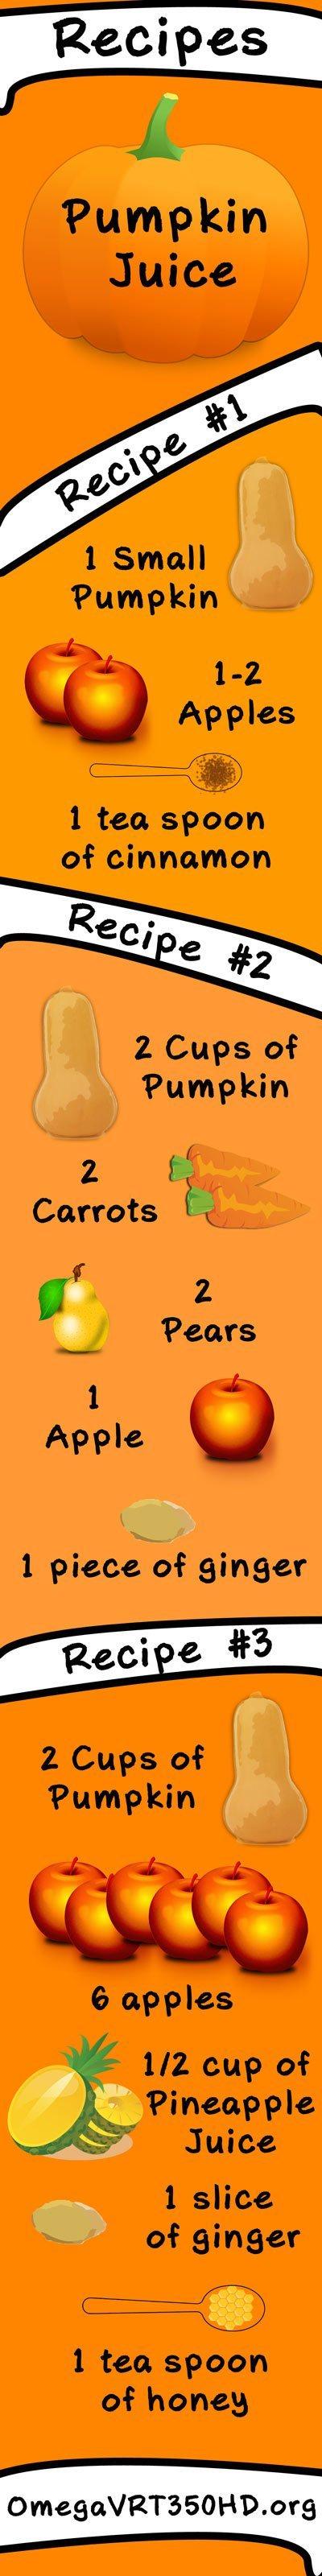 pumpkin juice recipe infographic